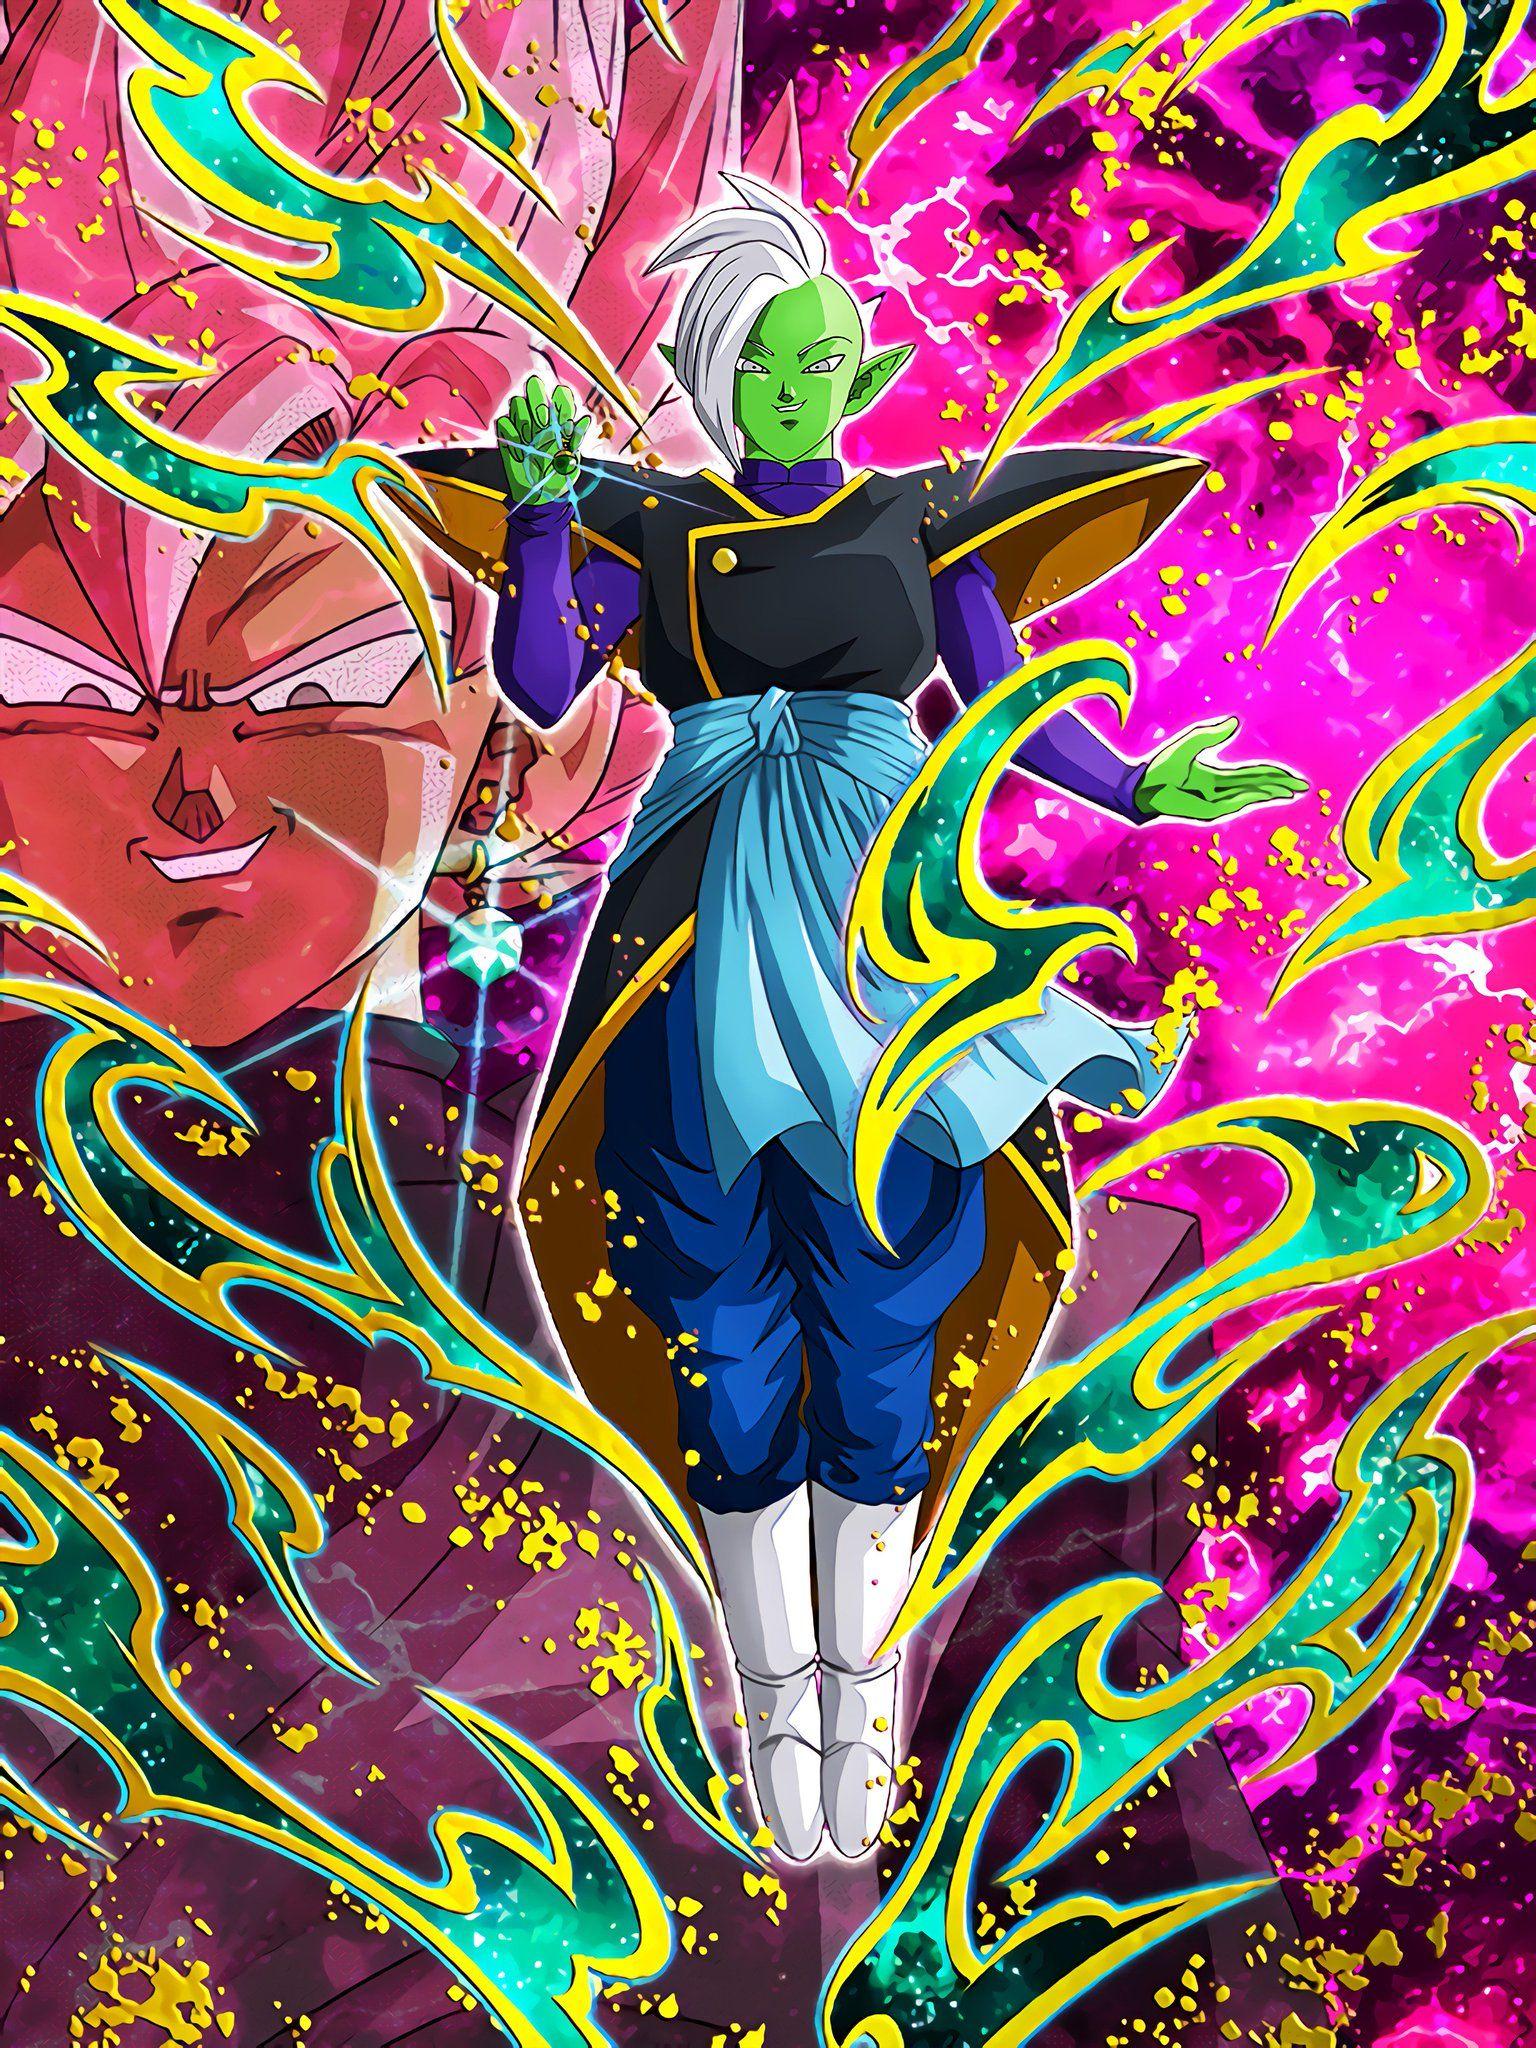 Hydros On Twitter Dragon Ball Super Artwork Anime Dragon Ball Dragon Ball Art